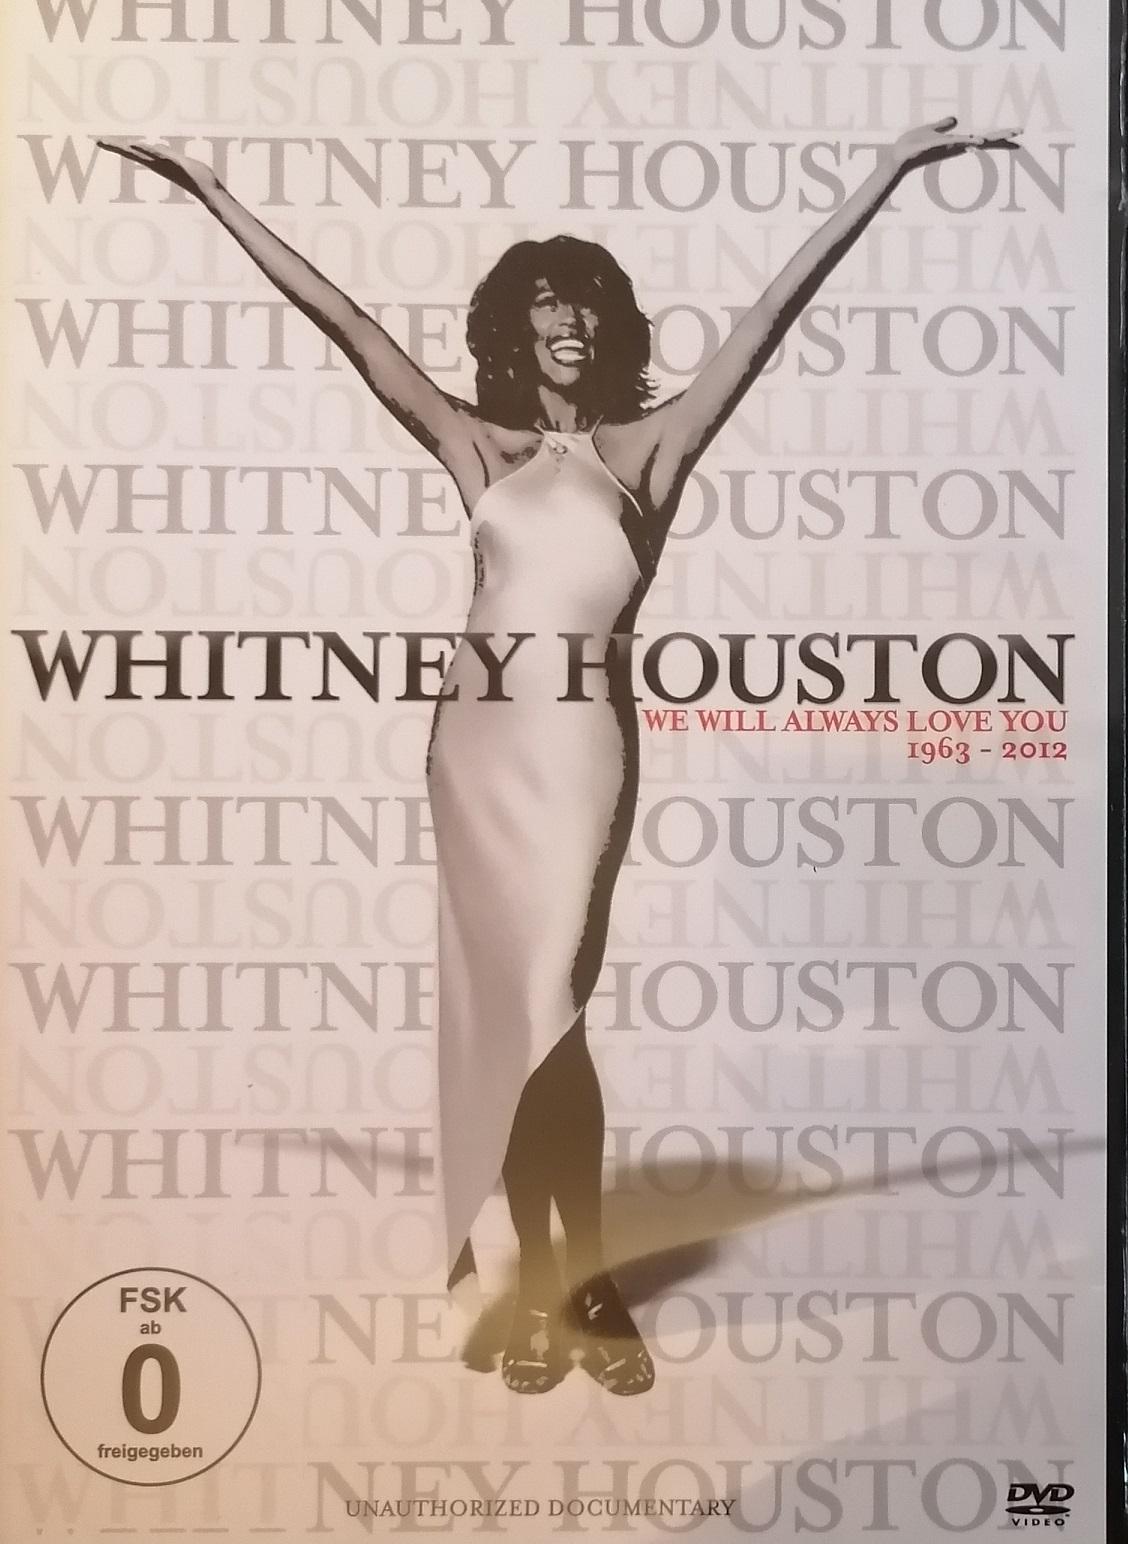 Whitney Houston - We will always love you 1963-2012 - DVD plast